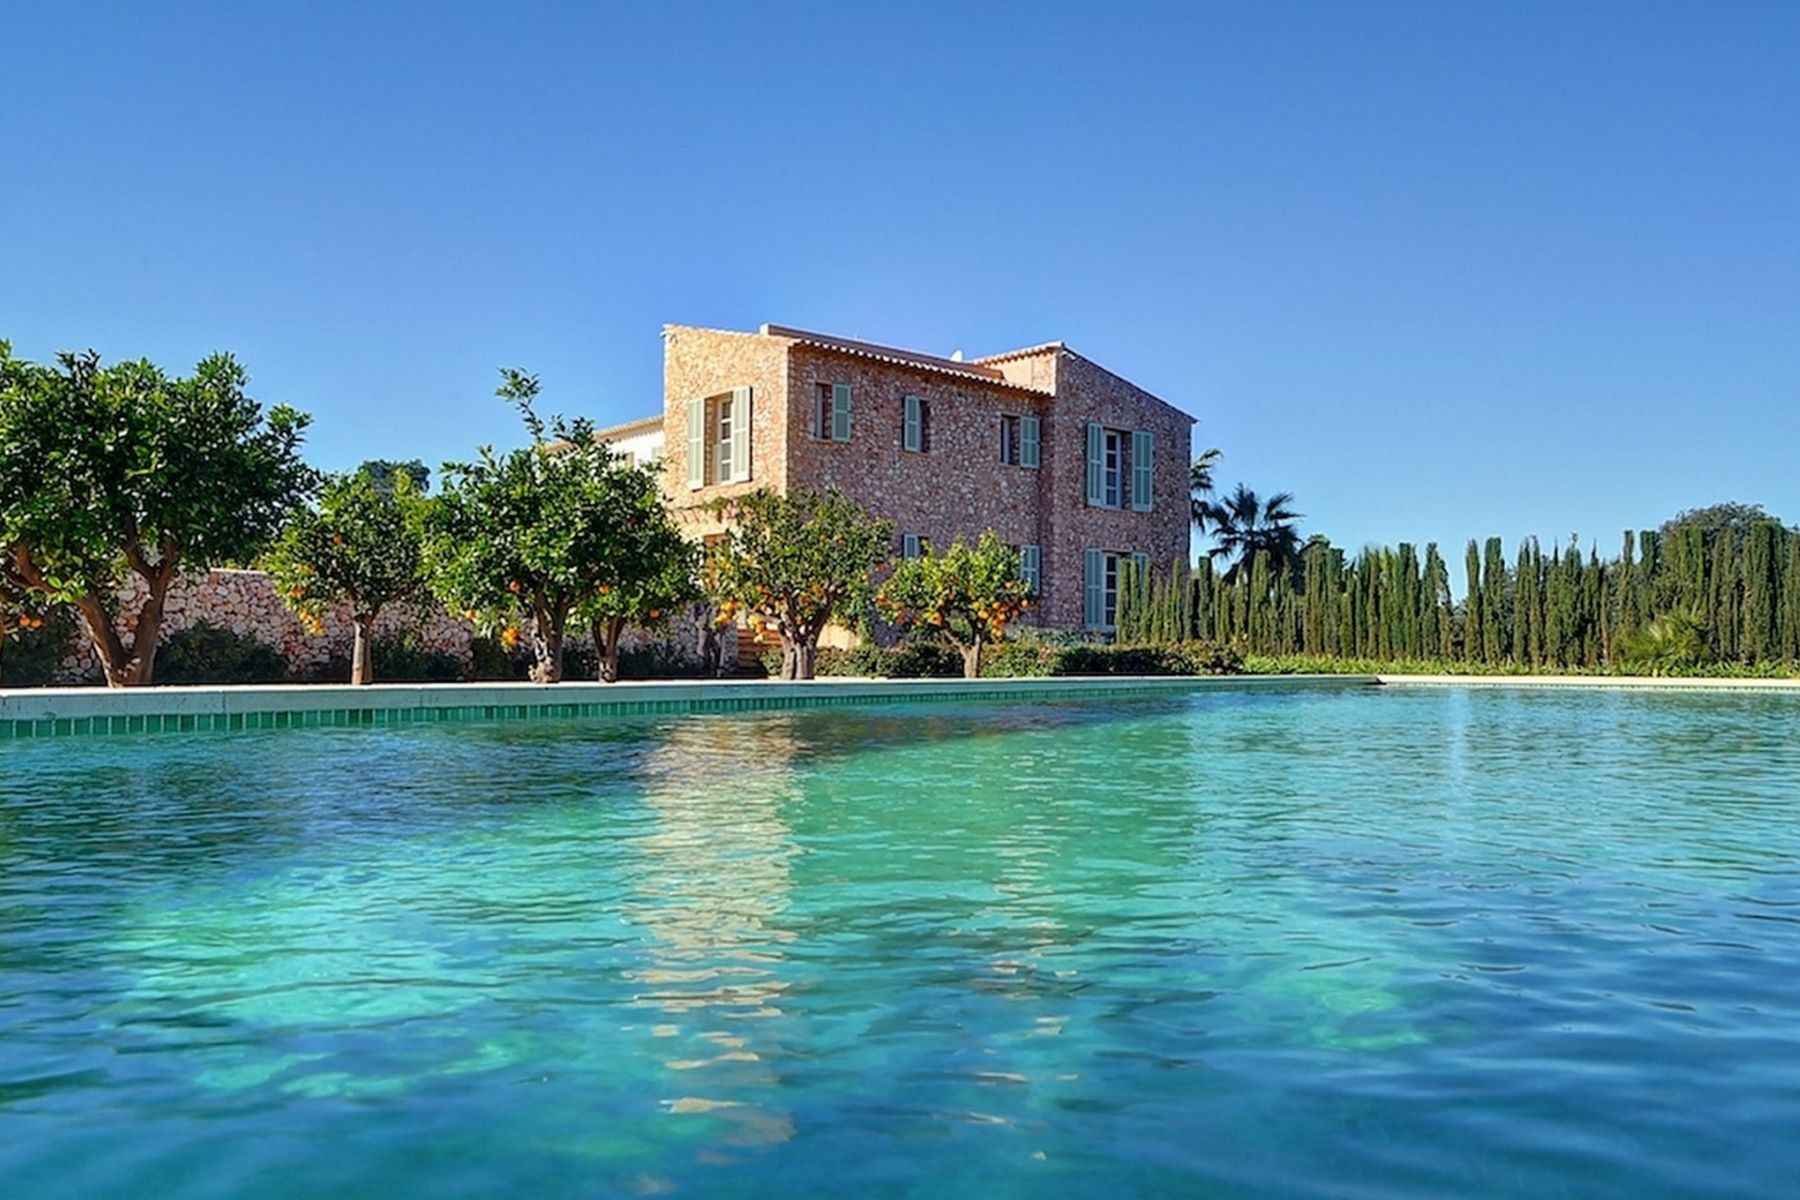 Single Family Homes for Sale at Finca in Felanitx for sale ofi Palma De Mallorca, Balearic Islands 00000 Spain